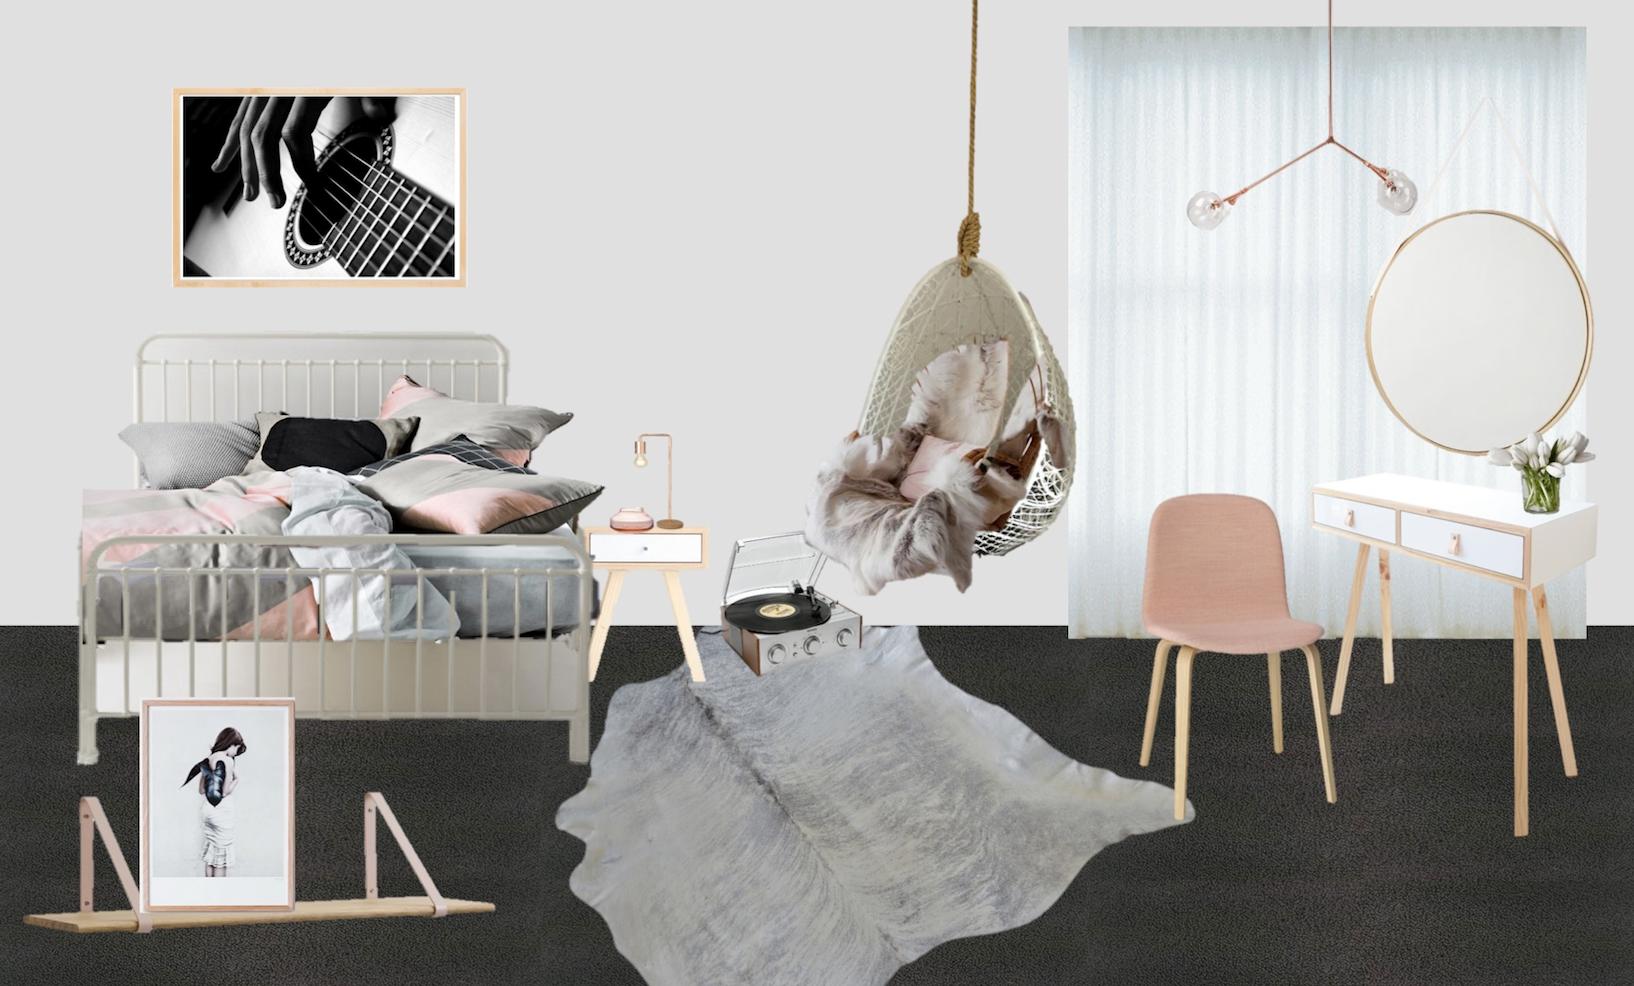 Digital design of Scandiavian teen retreat